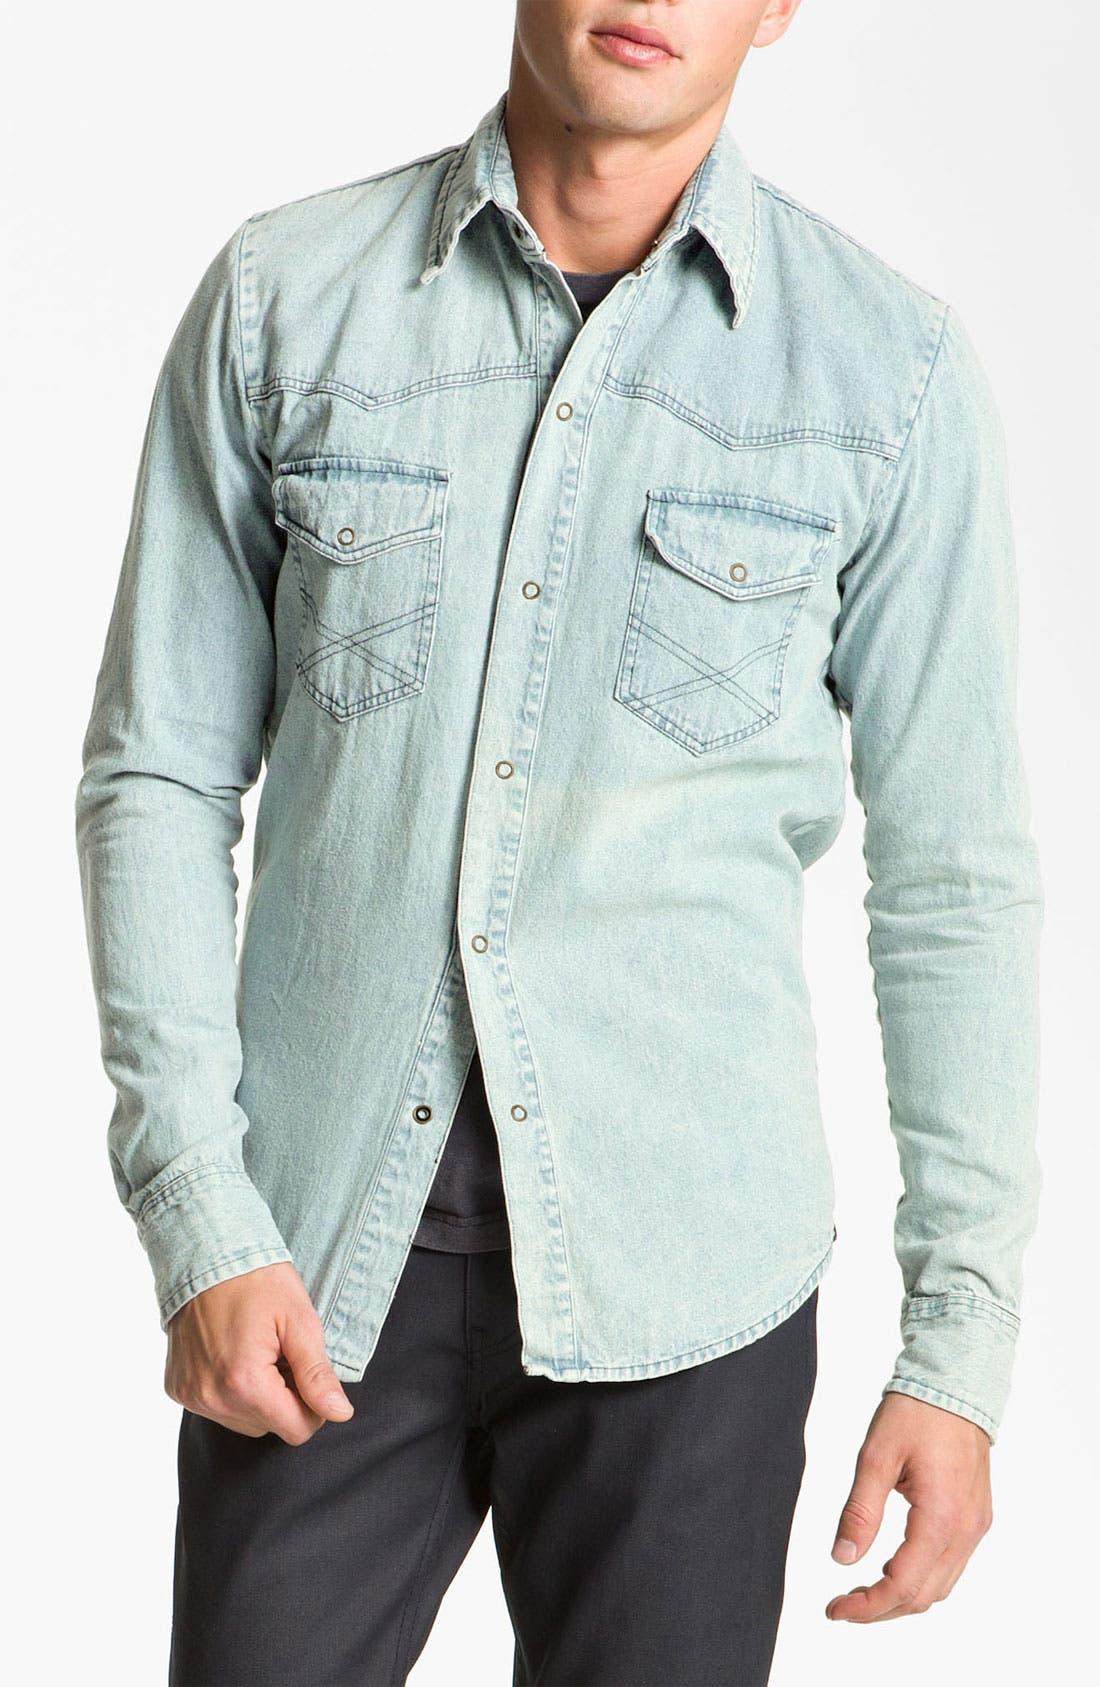 Alternate Image 1 Selected - Vanguard Western Denim Shirt